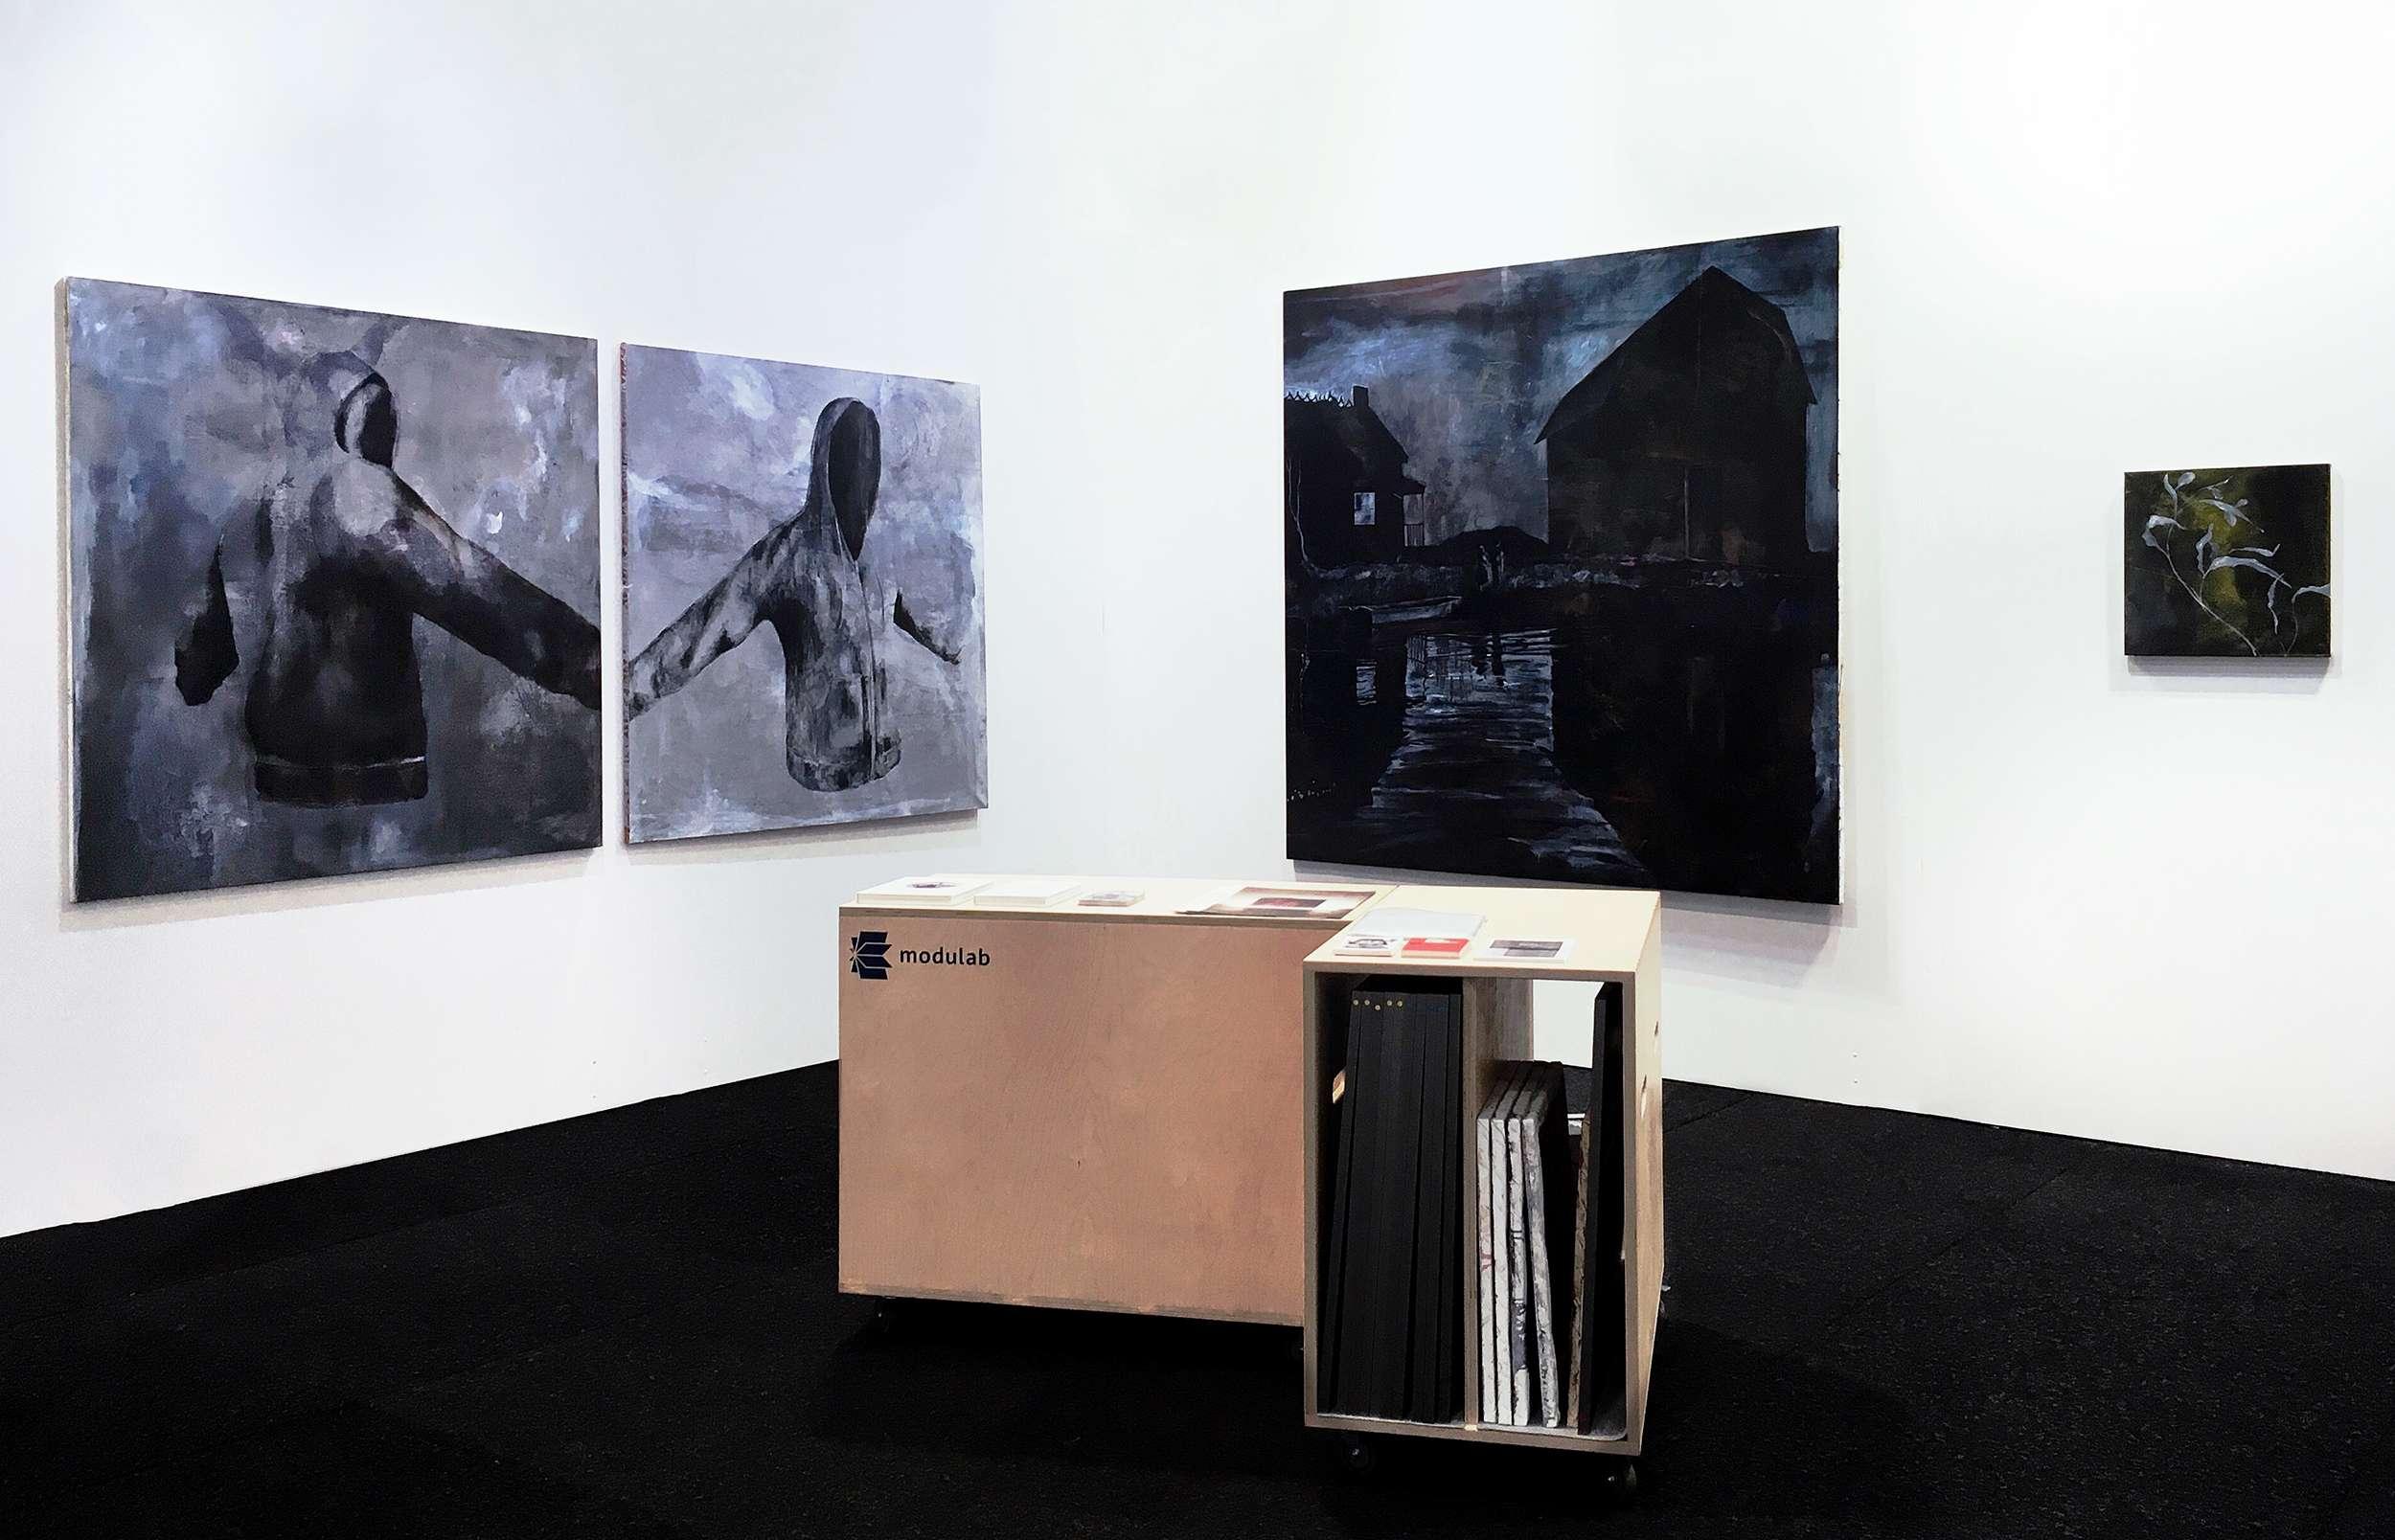 Modulab - Luxembourg Art Week 2019 - Luc Doerflinger